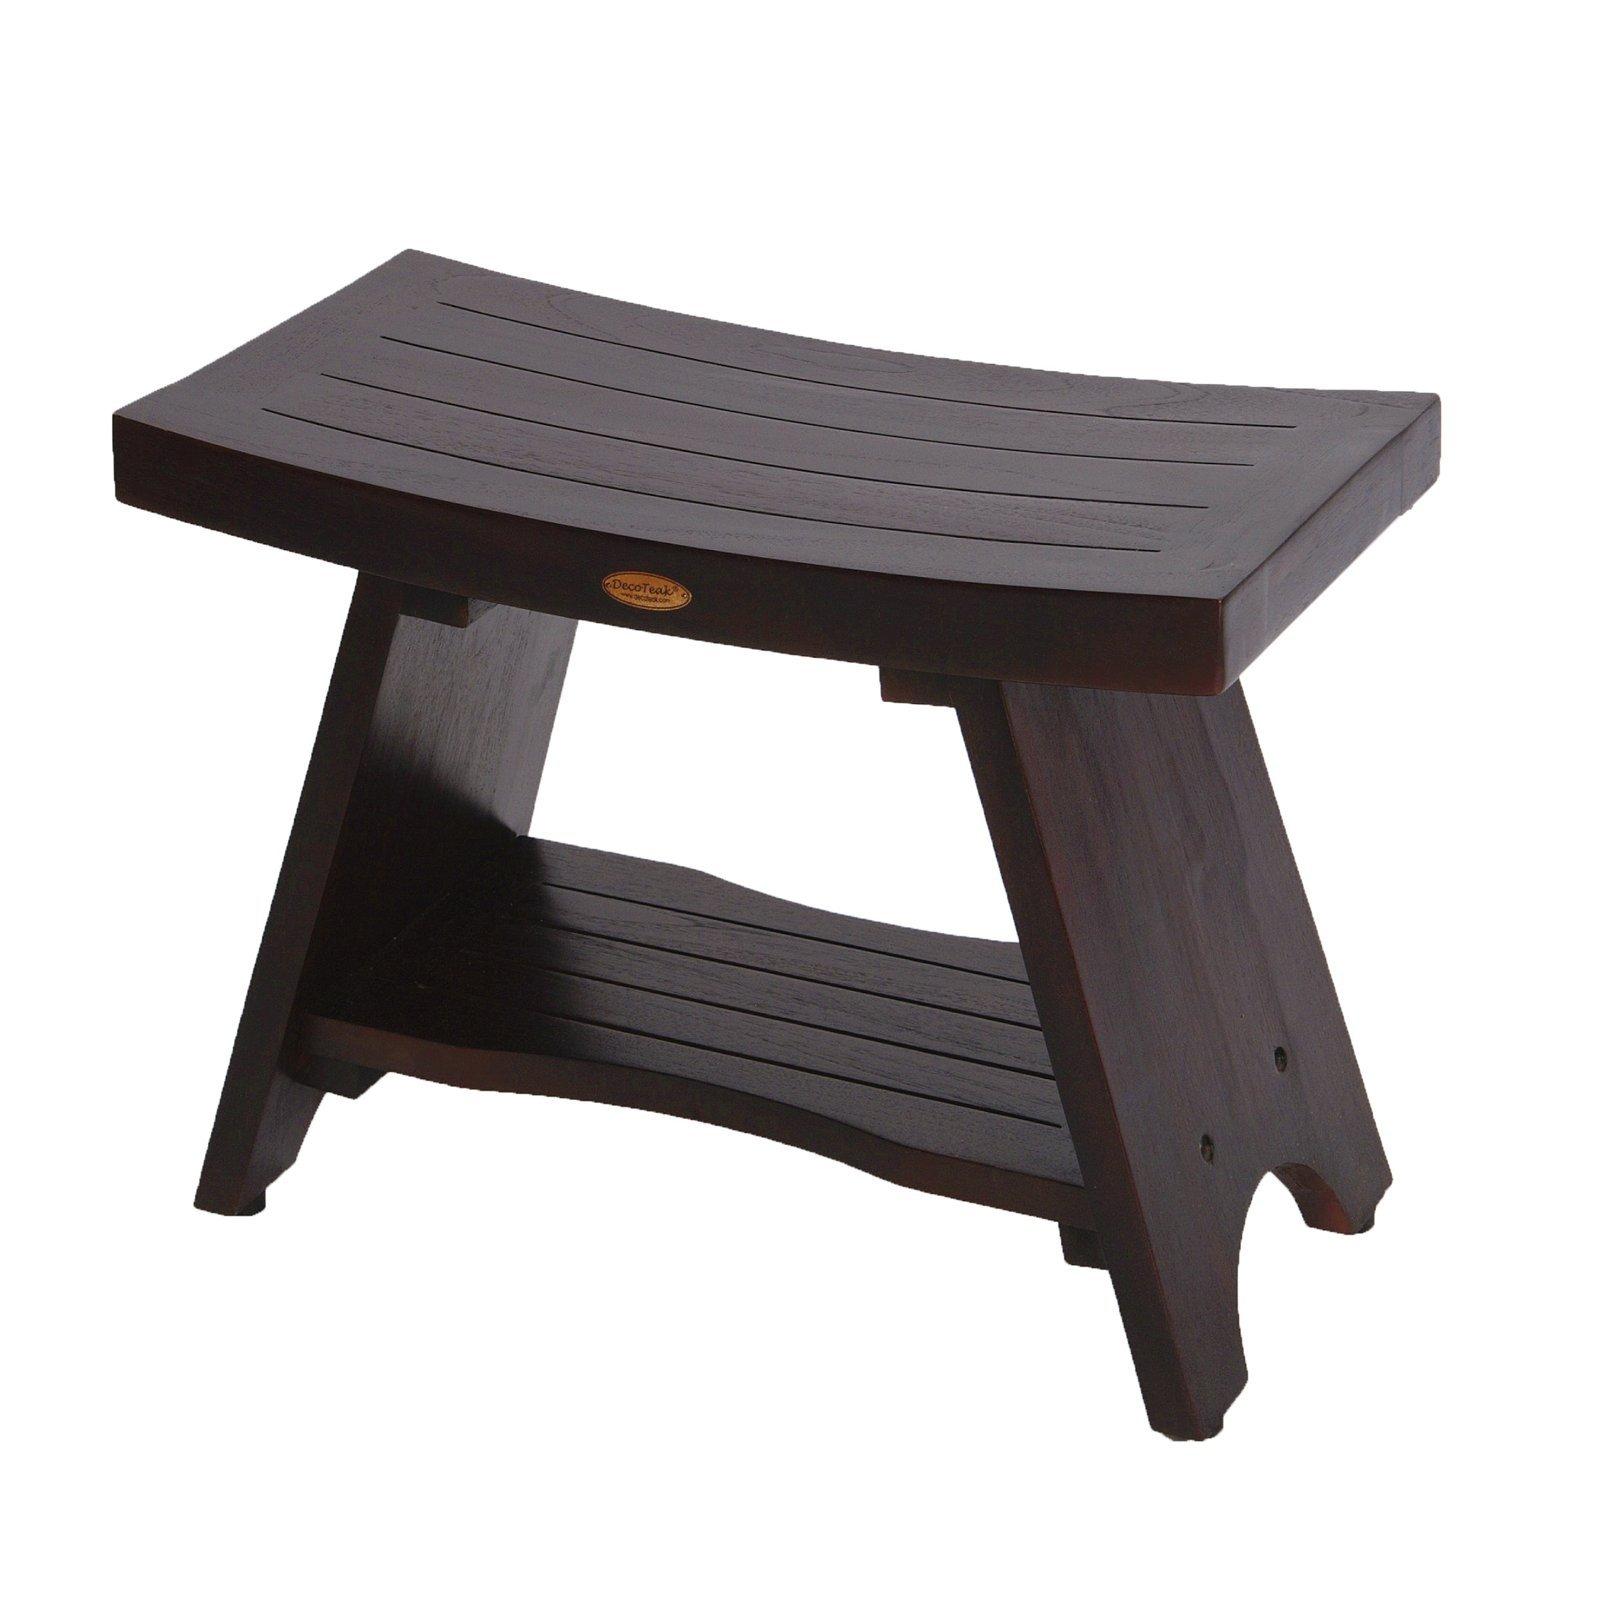 DecoTeak Serenity 24'' Eastern Style Teak Shower Bench With Shelf